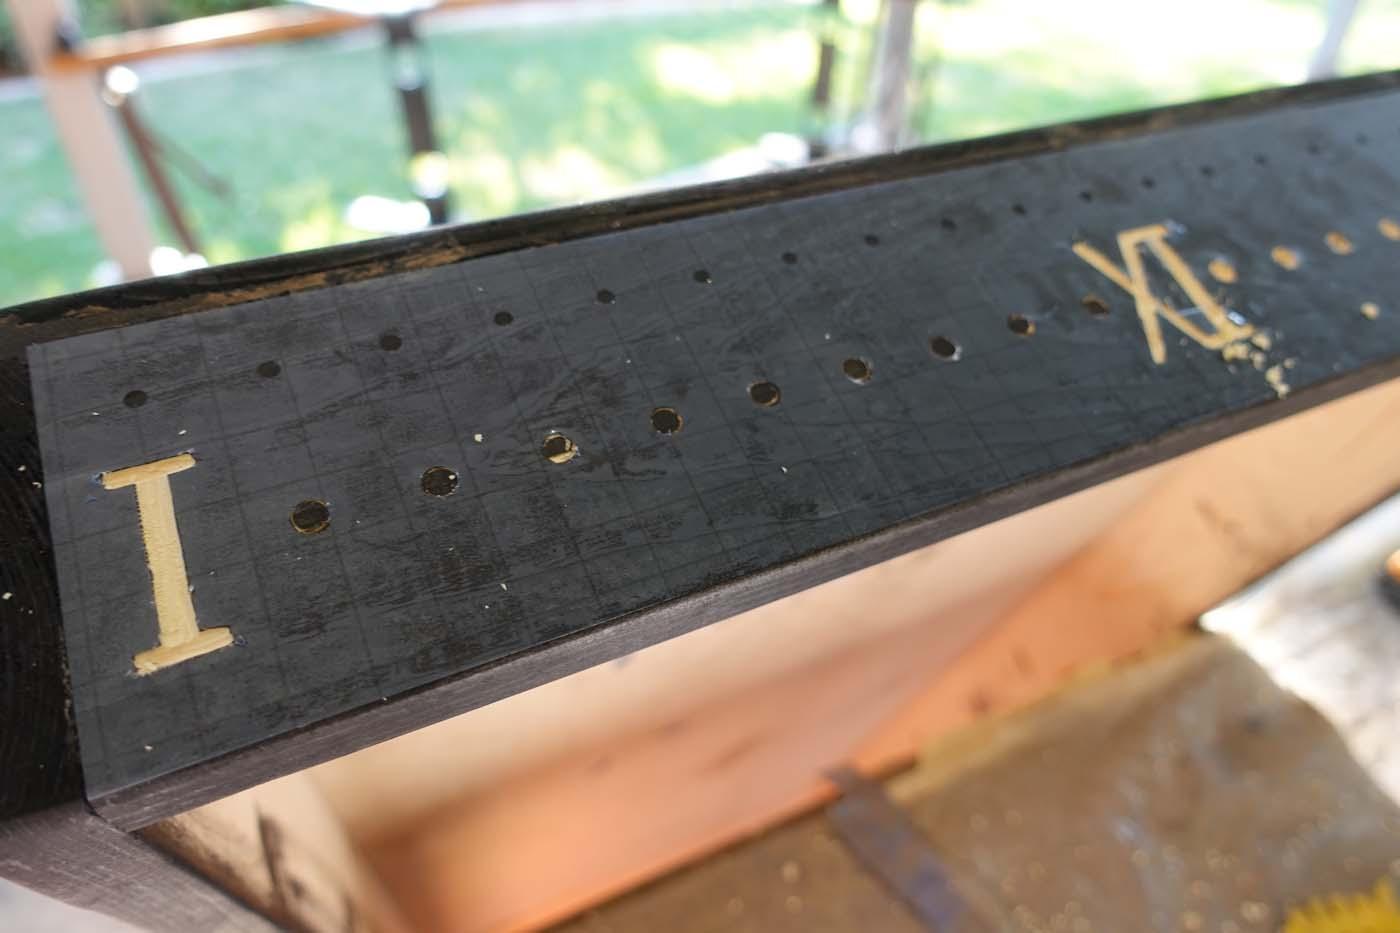 Carving a cornhole scoreboard with a Cricut stencil